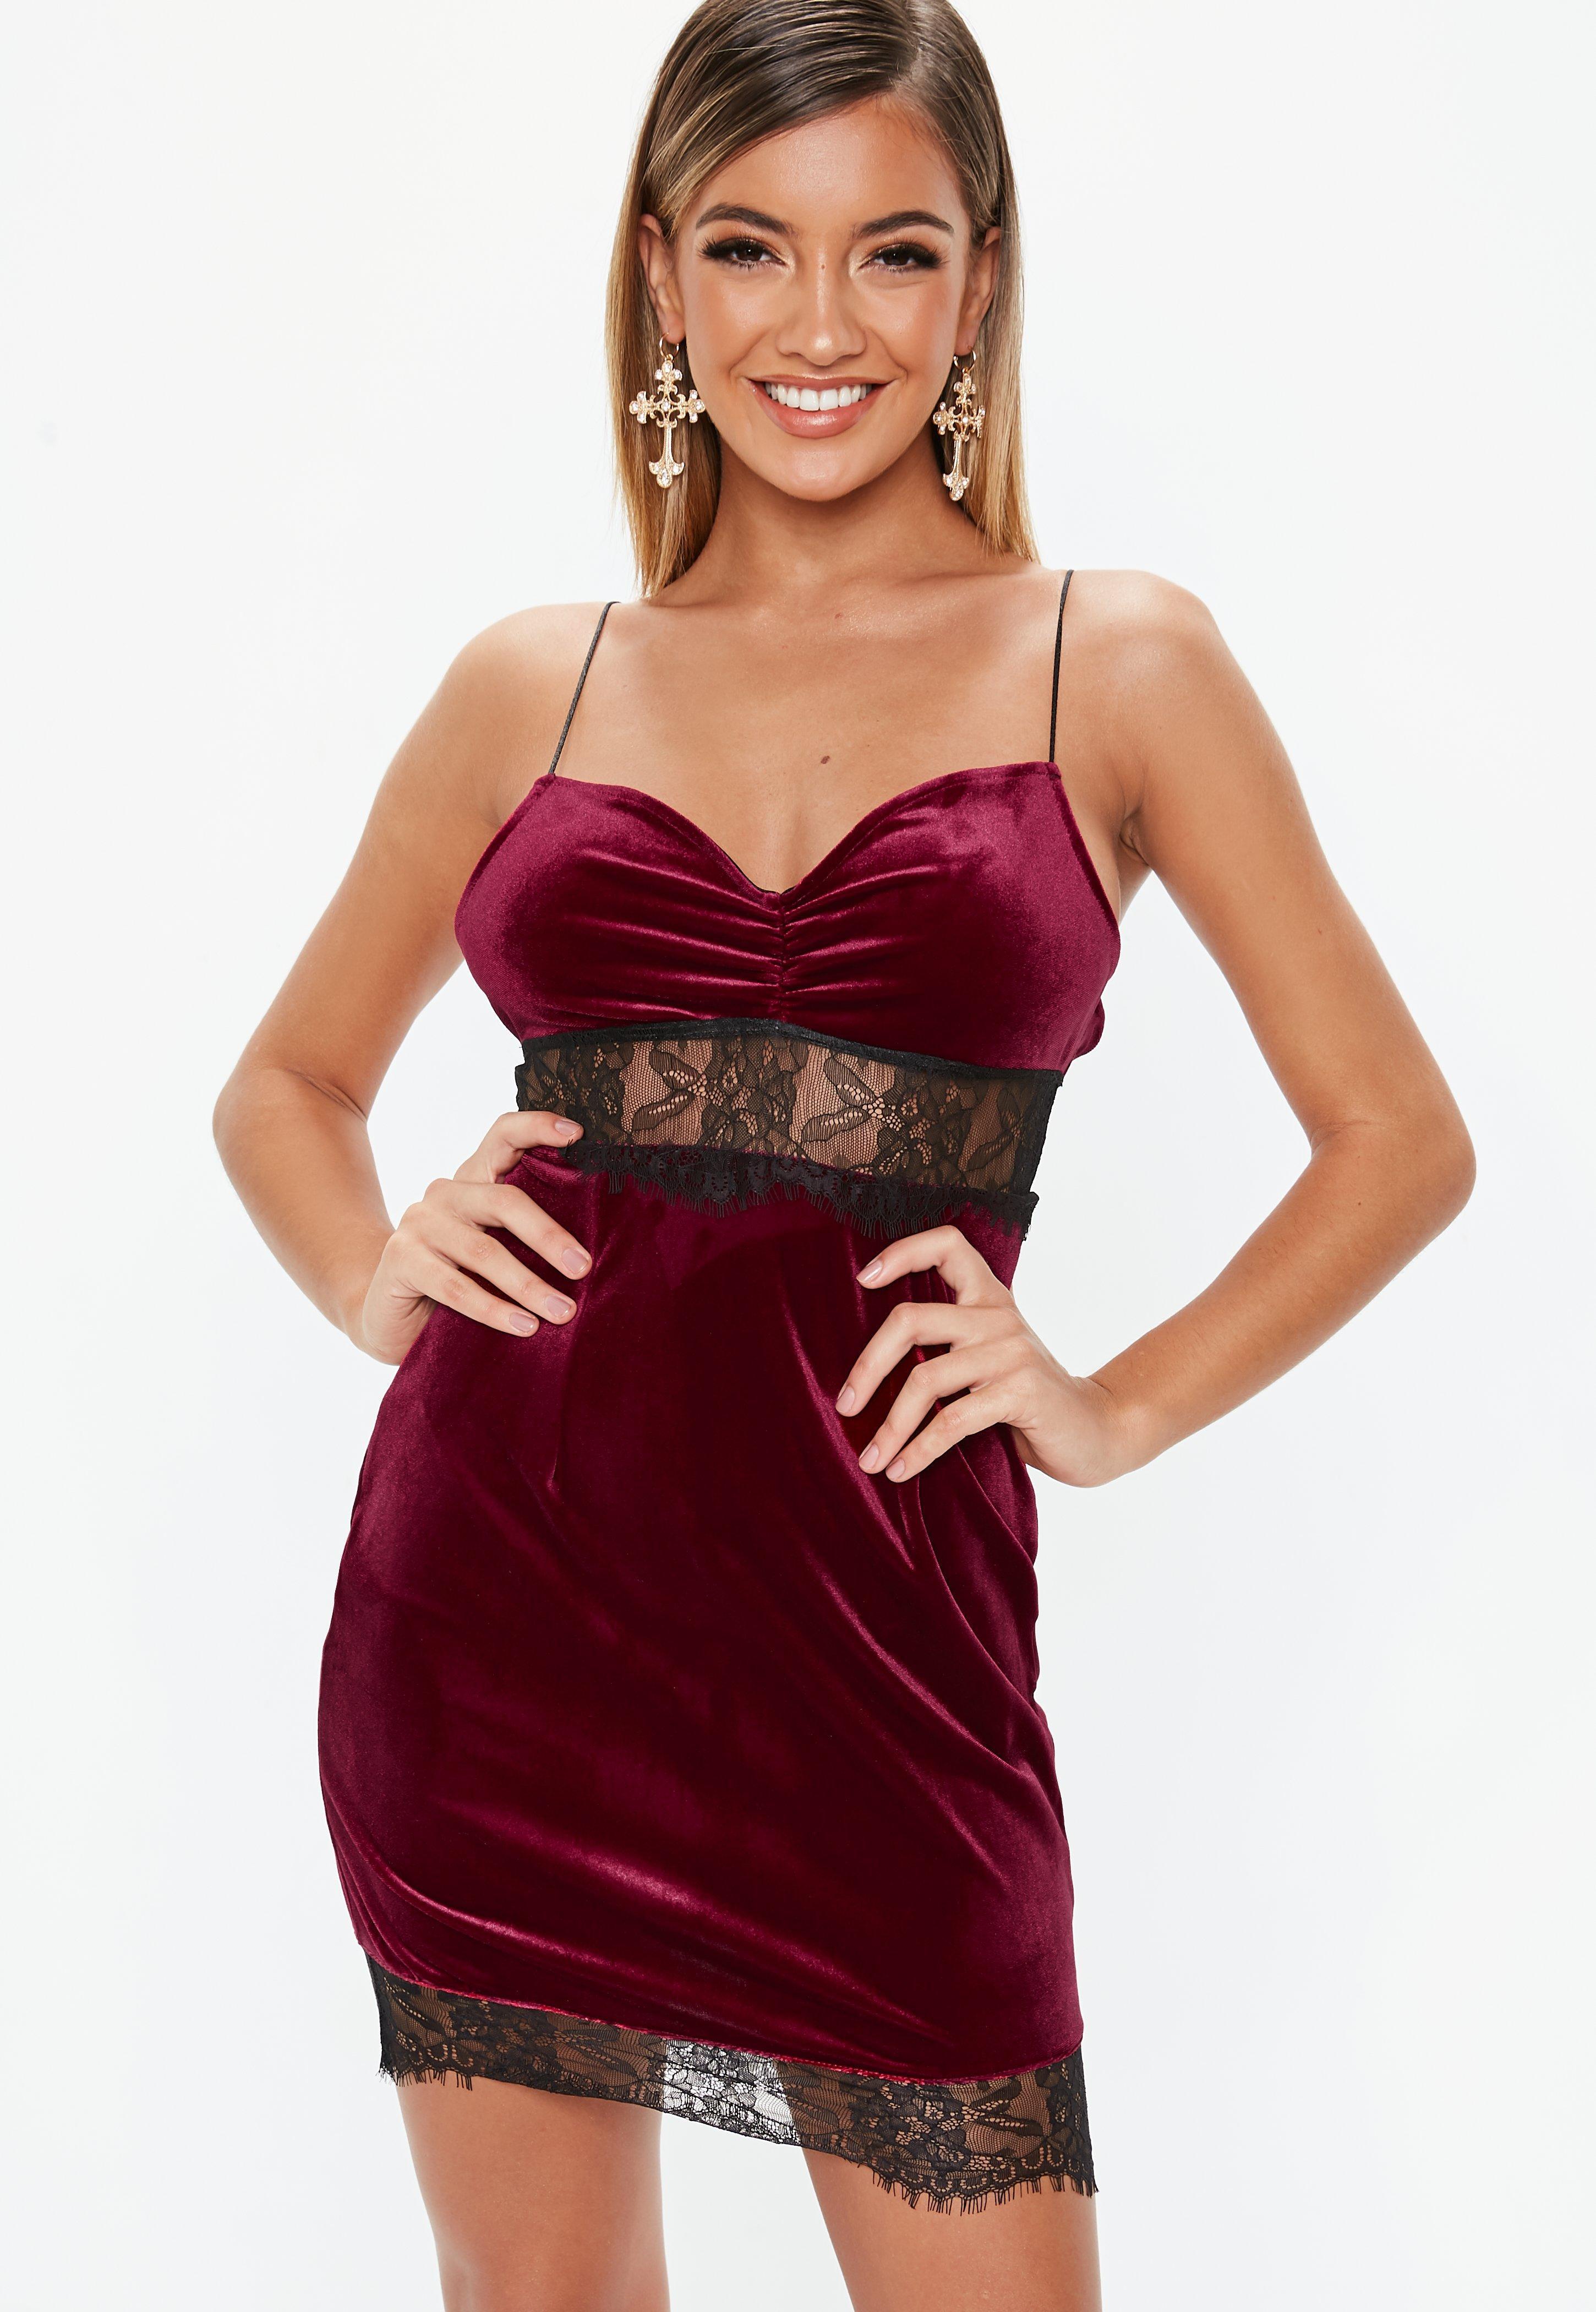 59de1d6adbca Lyst - Missguided Petite Burgundy Lace Insert Velvet Mini Dress in Red